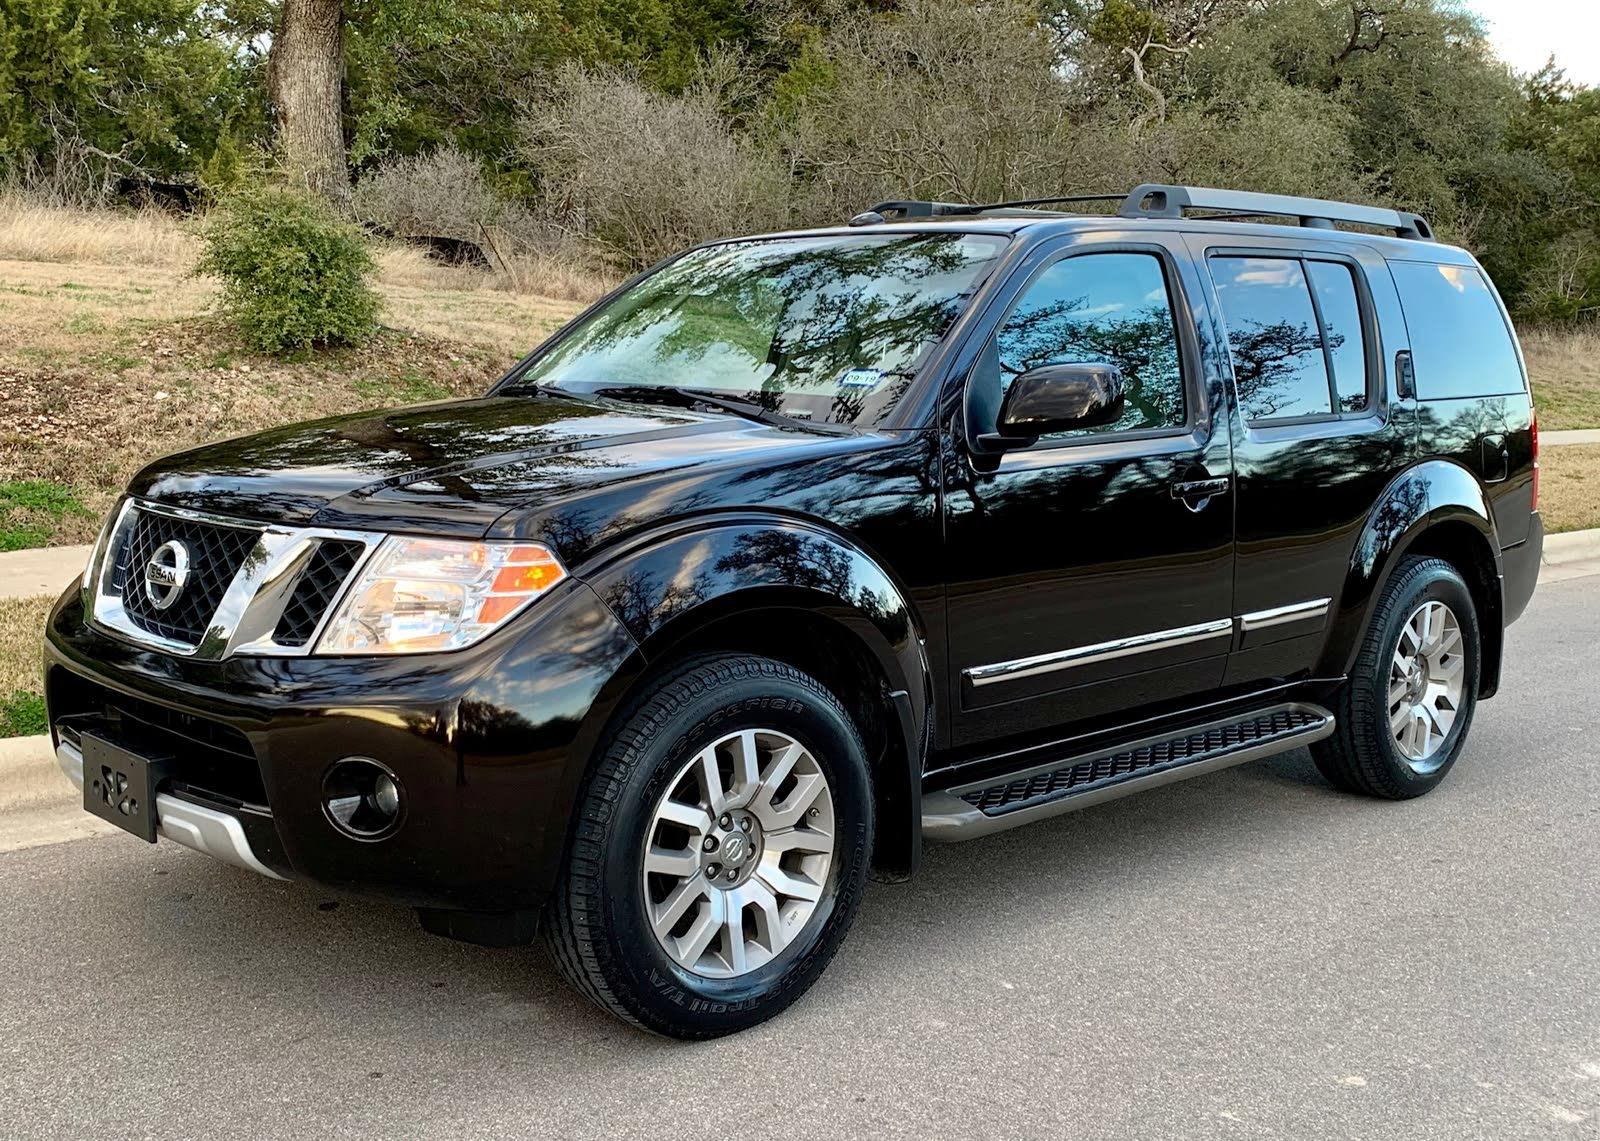 2011 Nissan Pathfinder - Overview